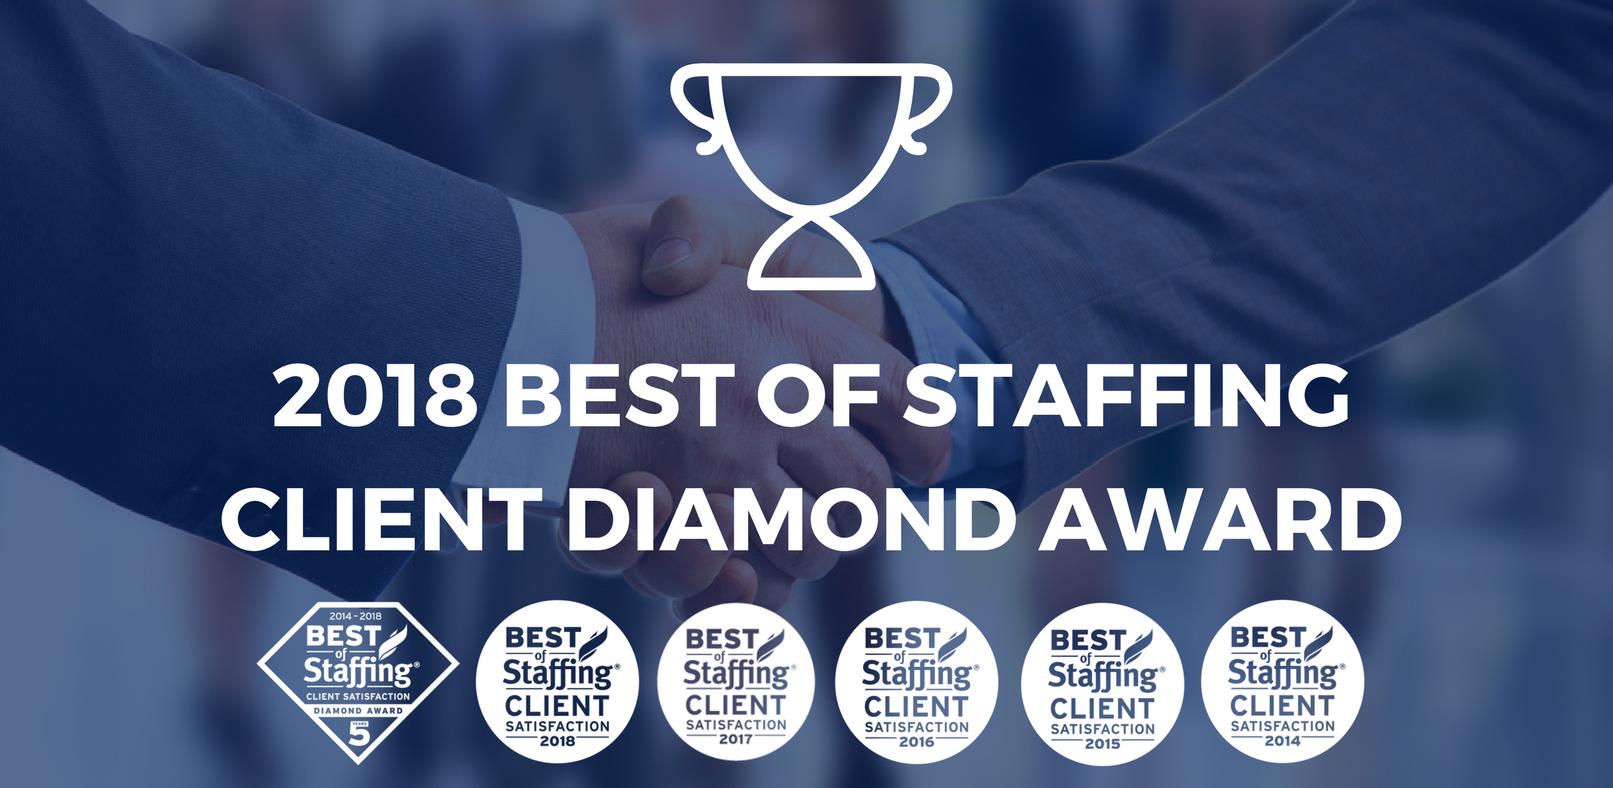 2018 Best of Staffing Client Diamond Award Winner.png